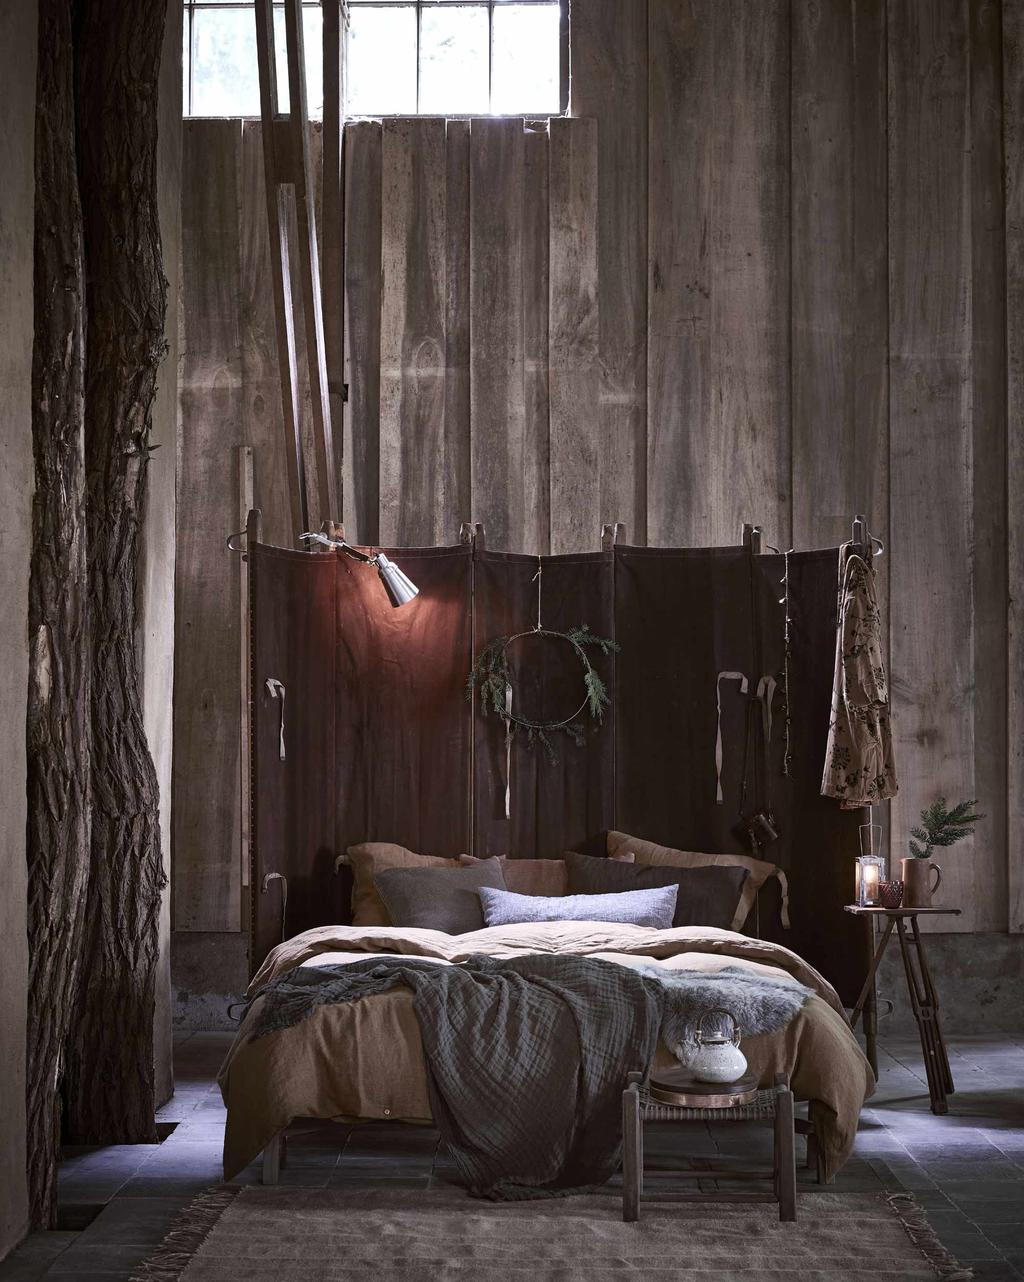 Winter lodge stijl | slaapkamer